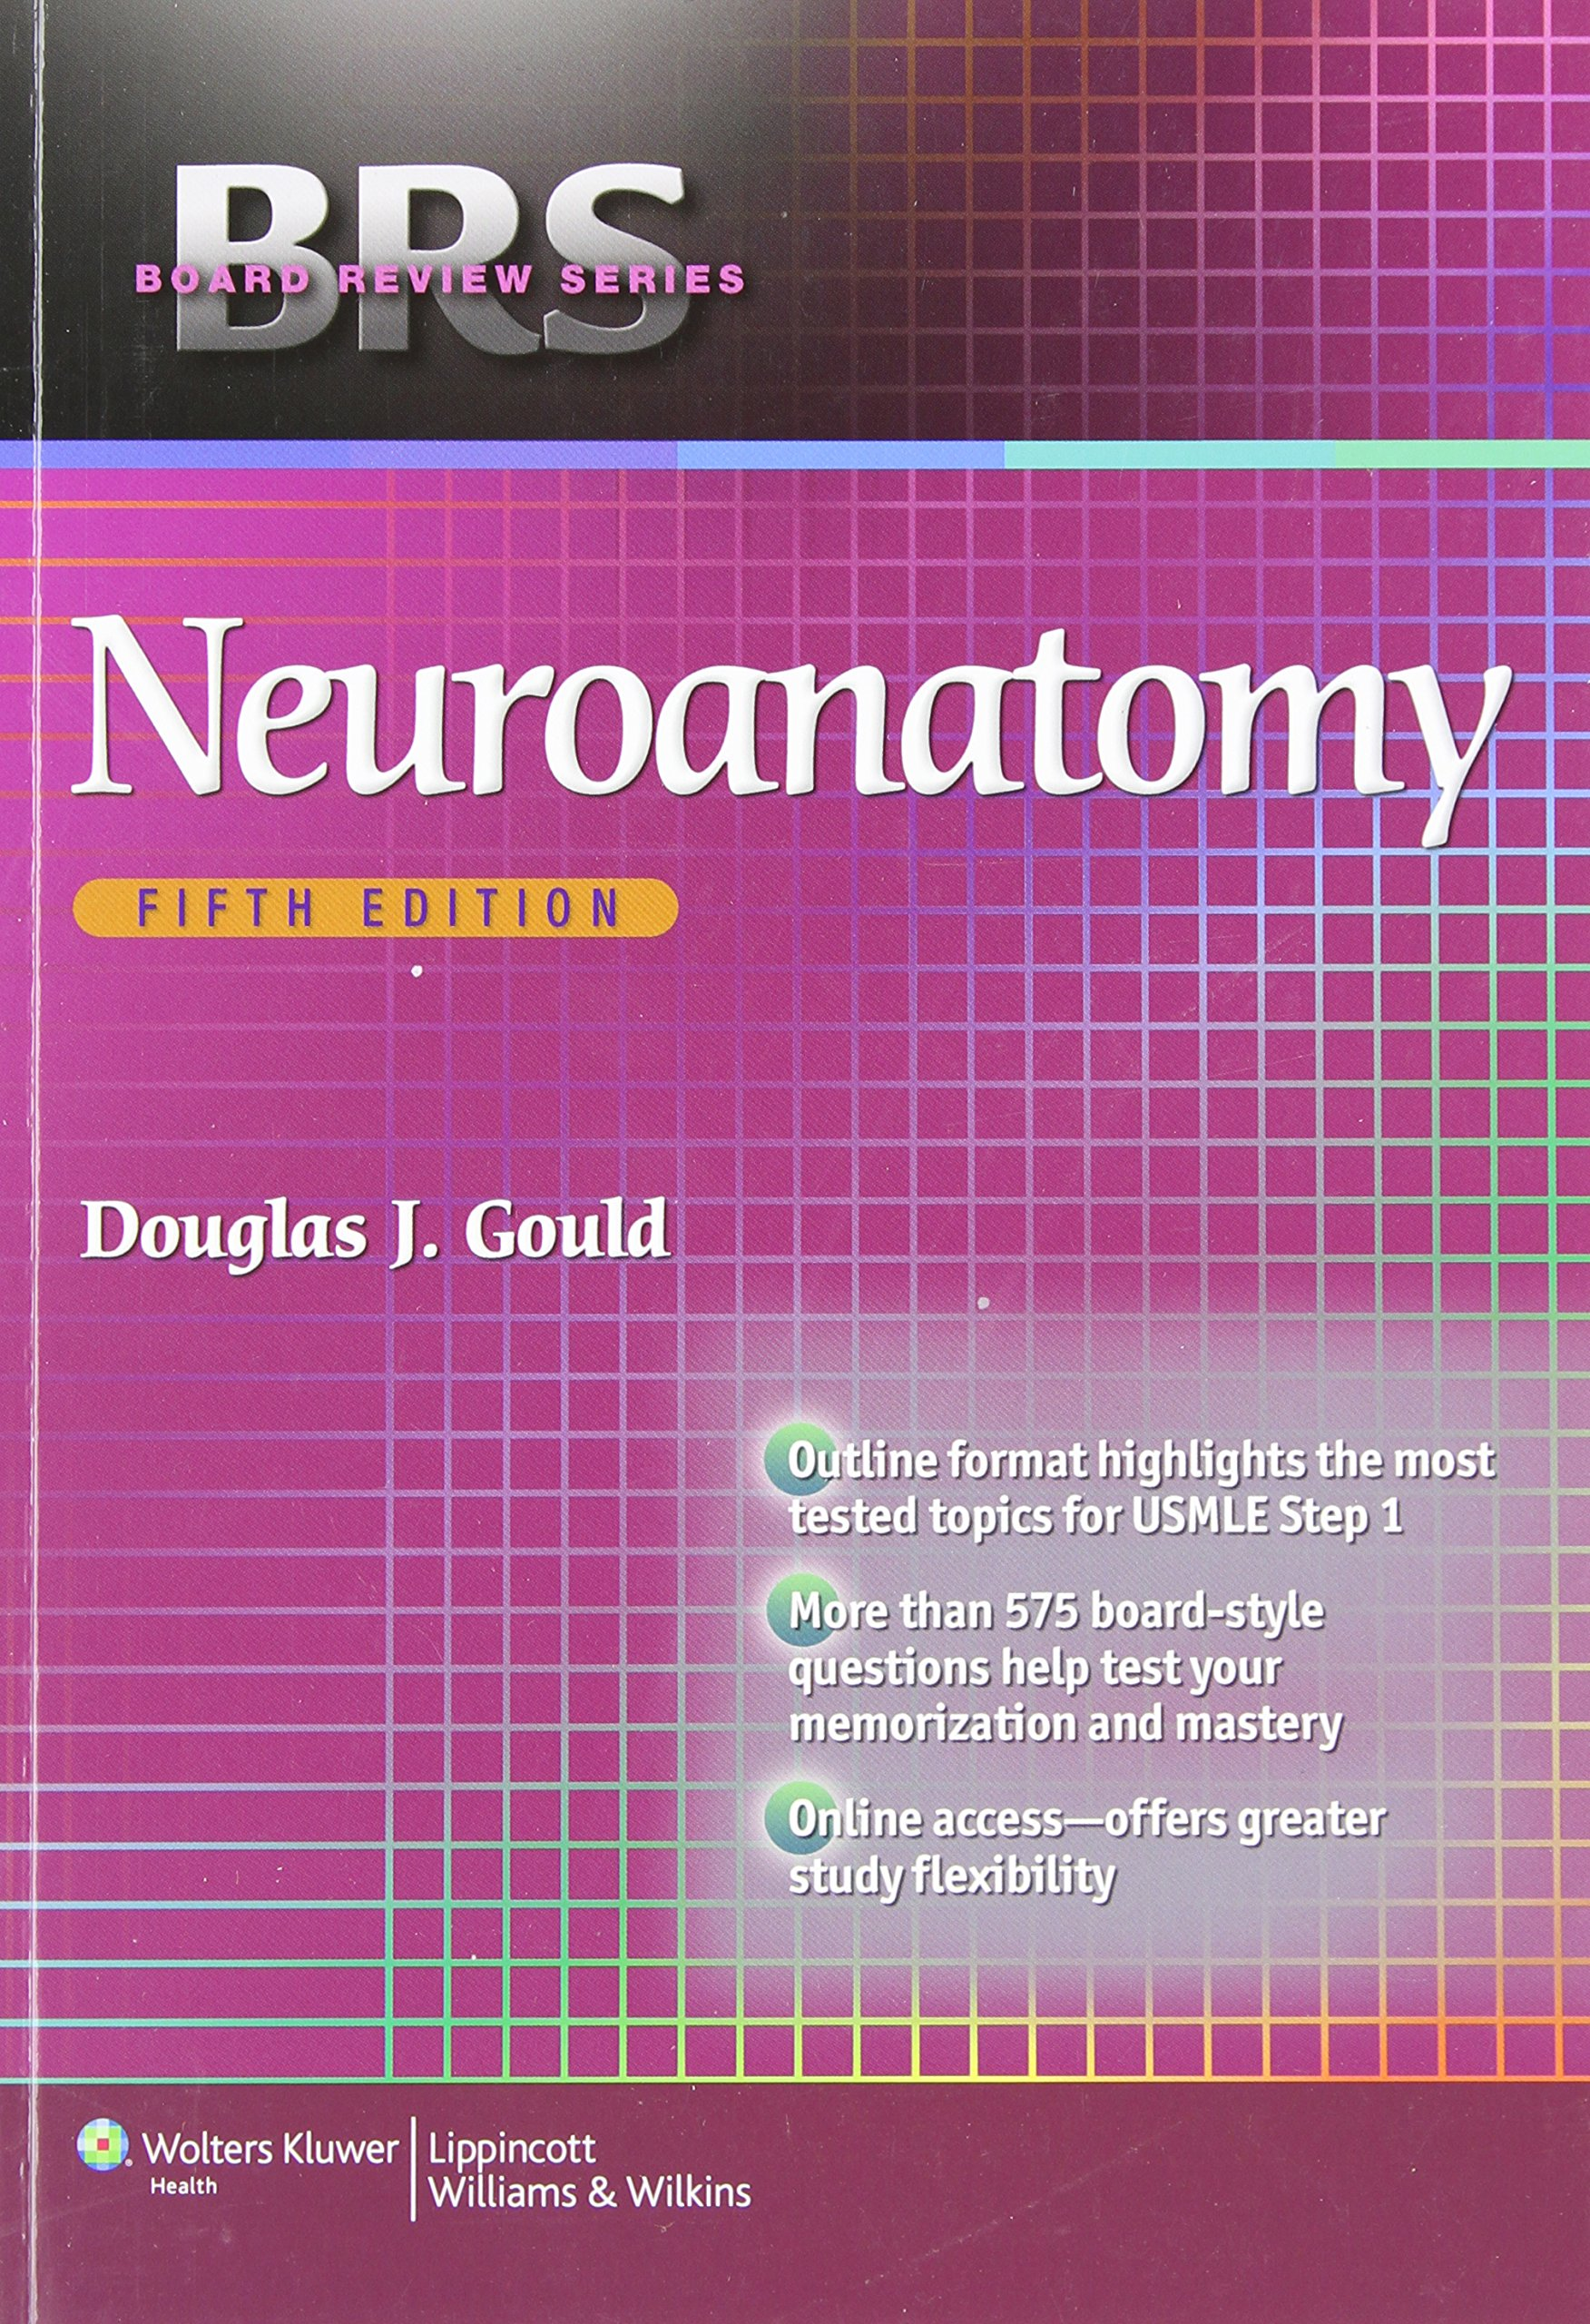 BRS Neuroanatomy (Board Review Series): Amazon.co.uk: Douglas J ...